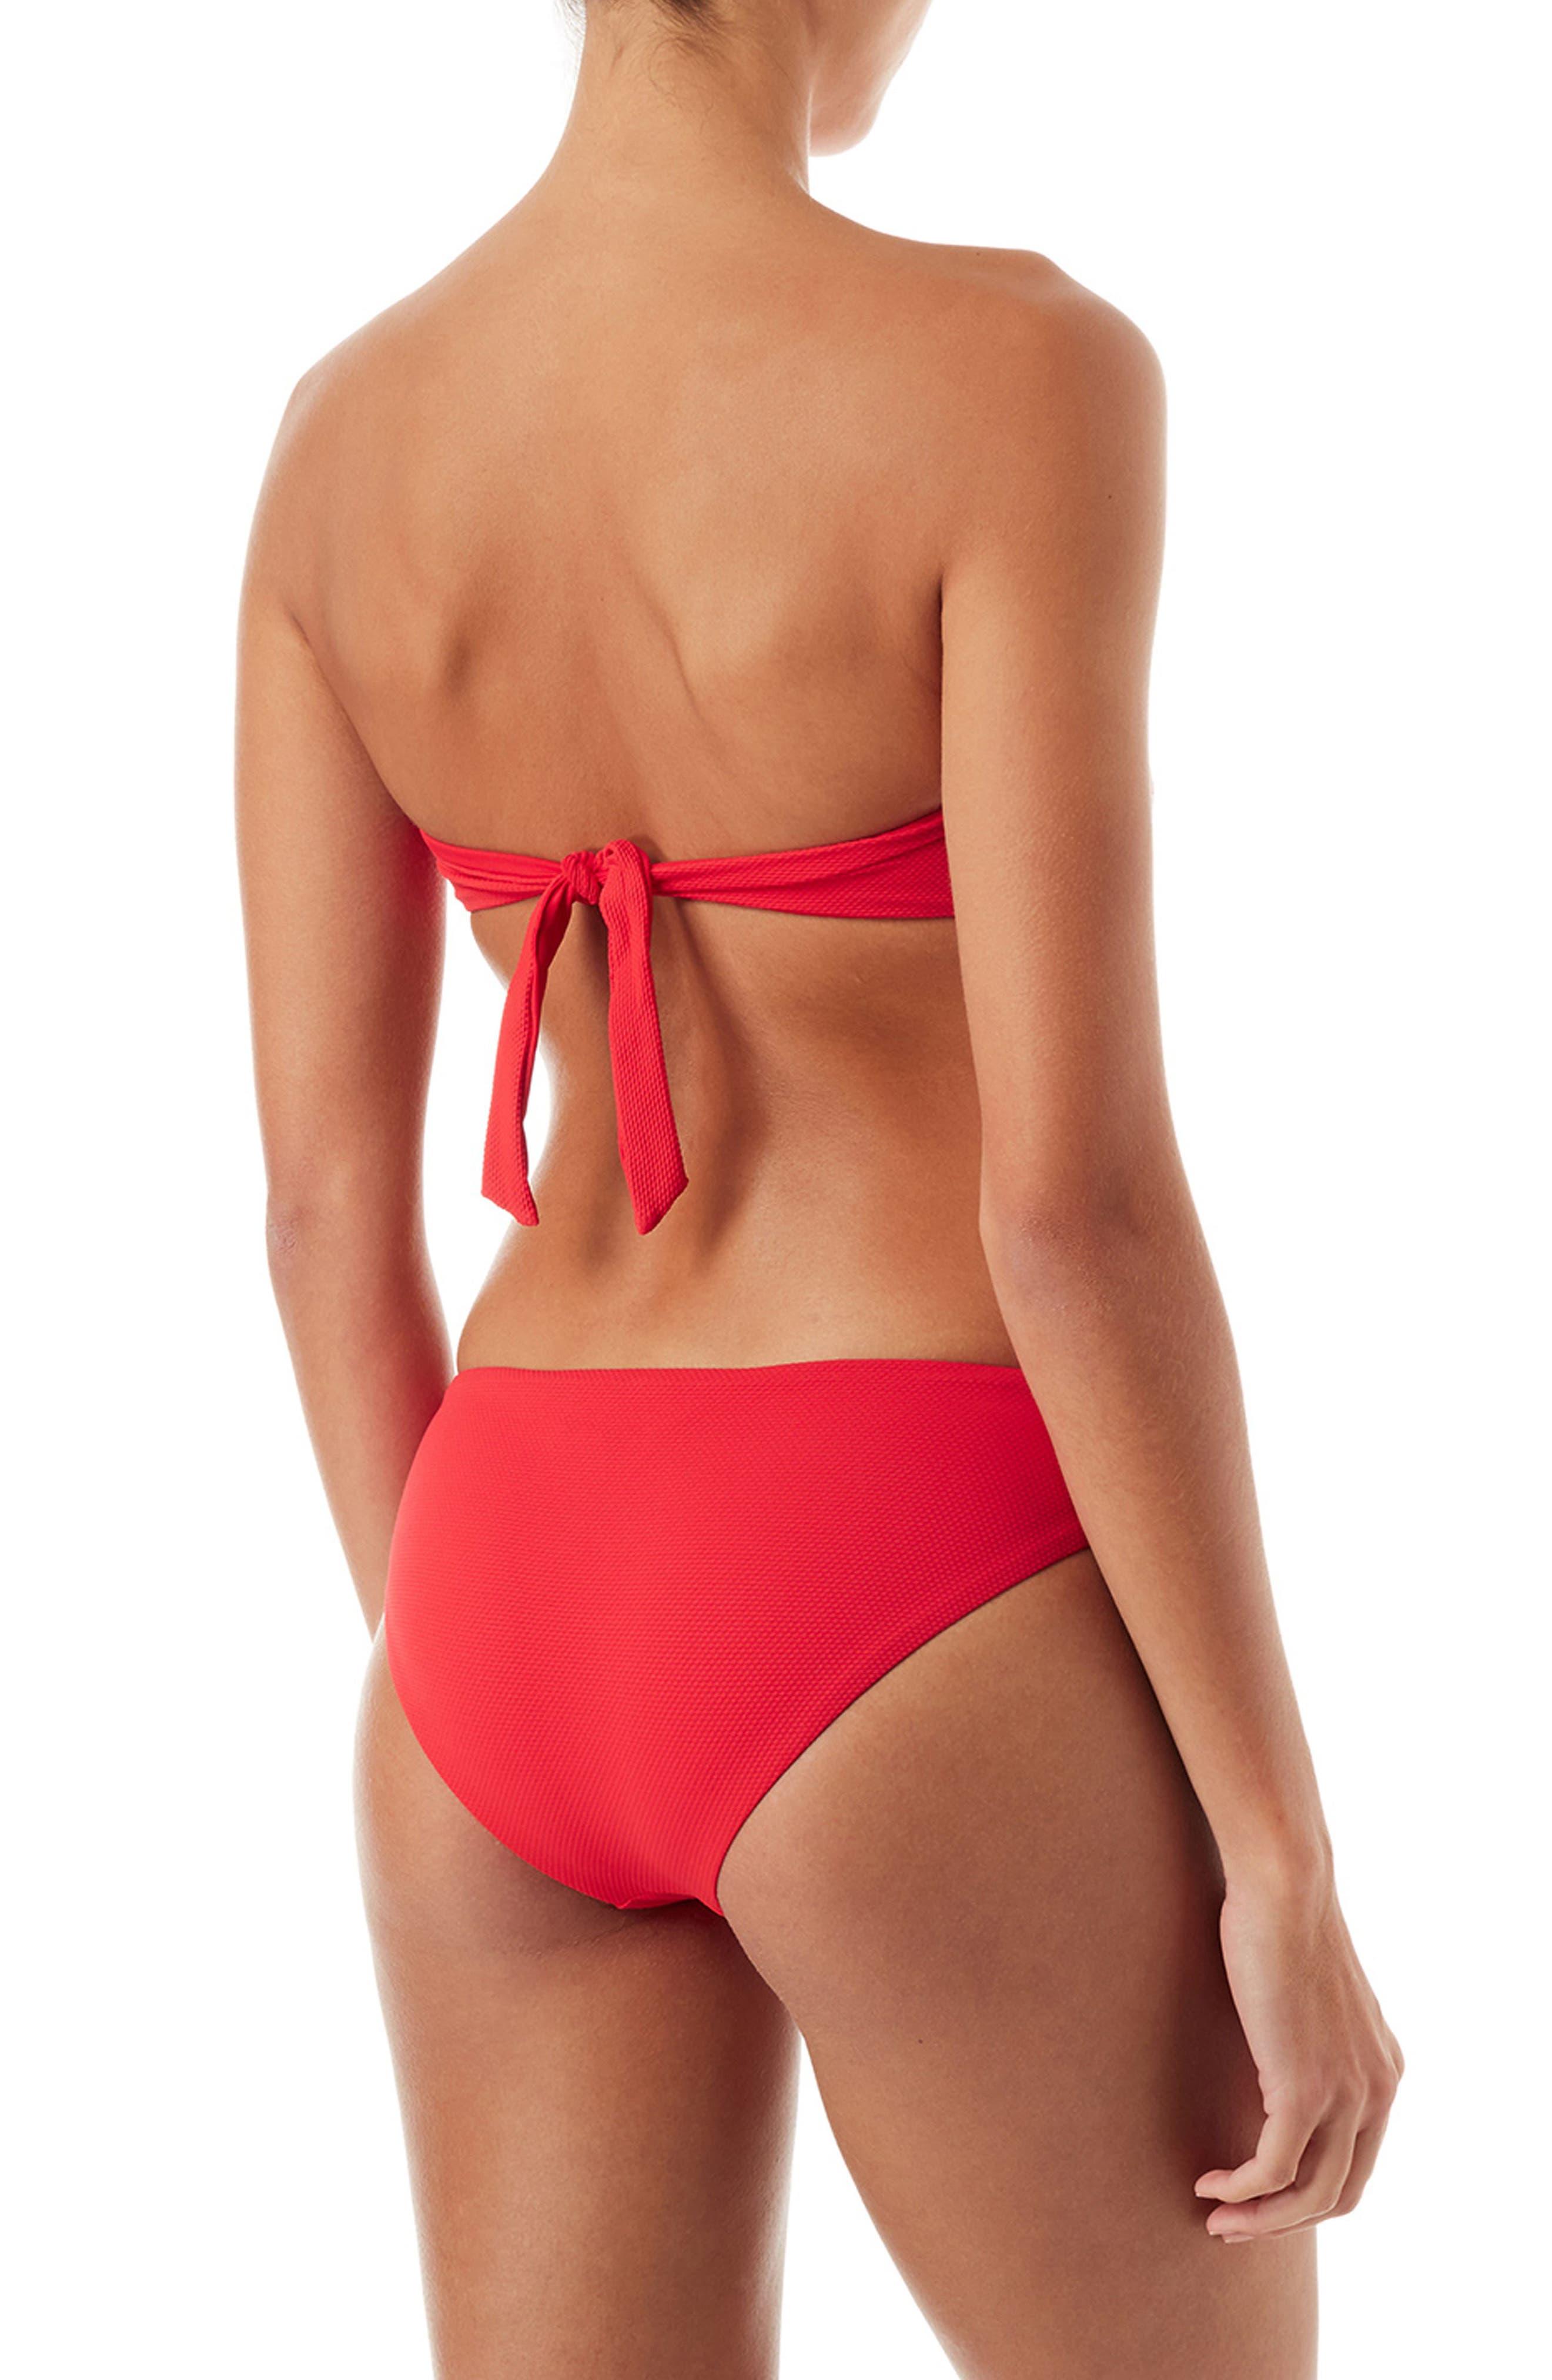 Angola Bandeau Bikini Top,                             Alternate thumbnail 4, color,                             Pique Red